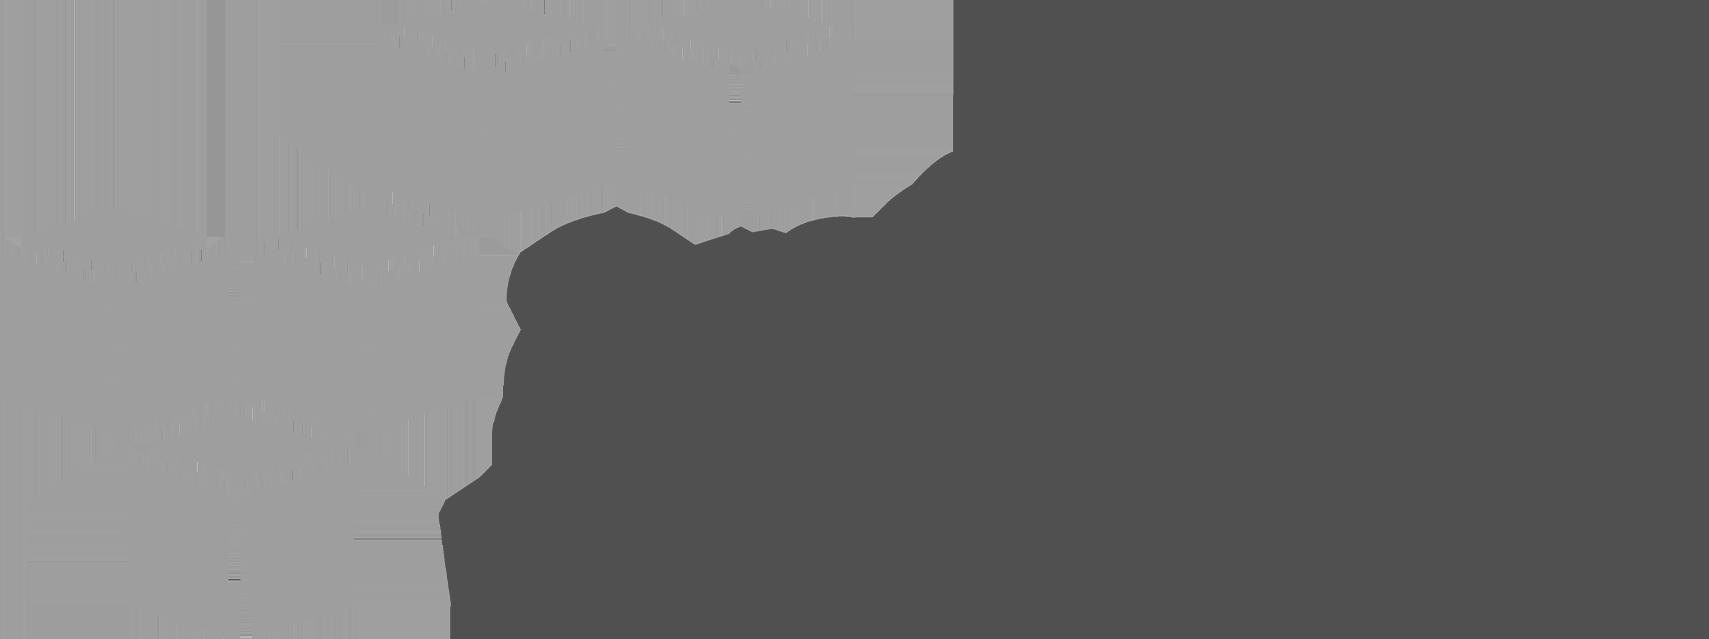 Amazon web services logo - black and white